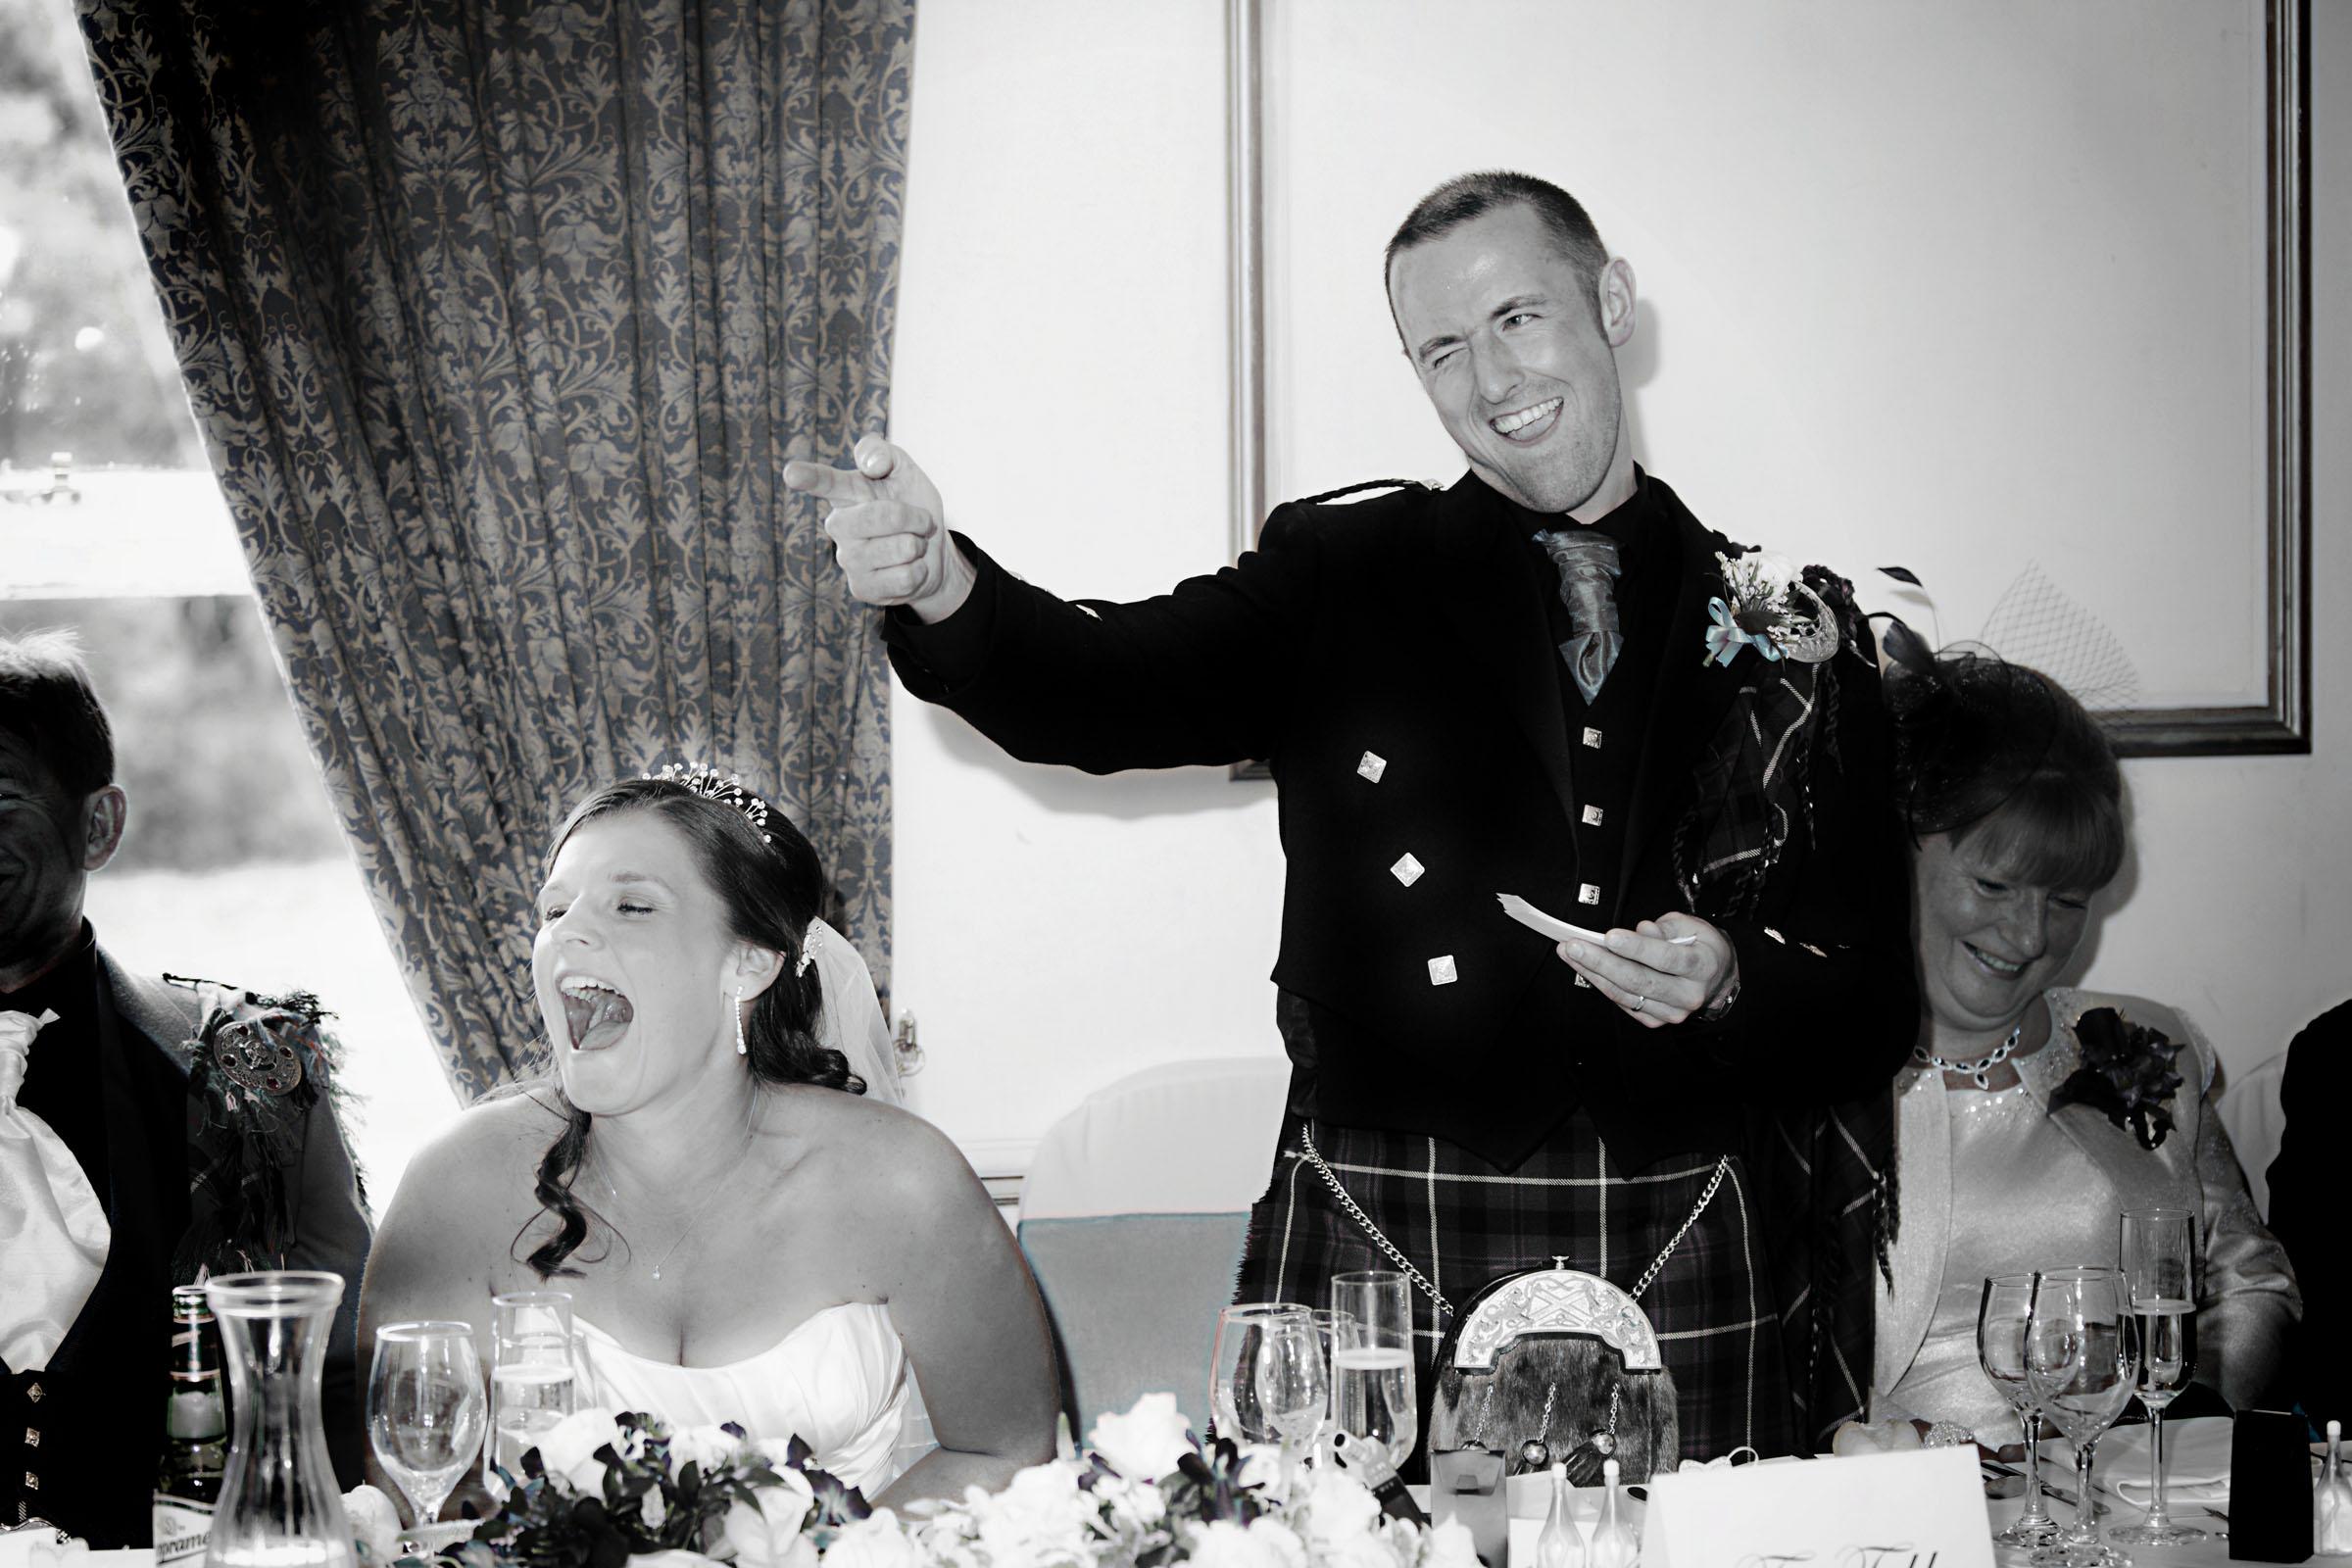 Grooms_speech_laughter_editorial wedding photography.jpg